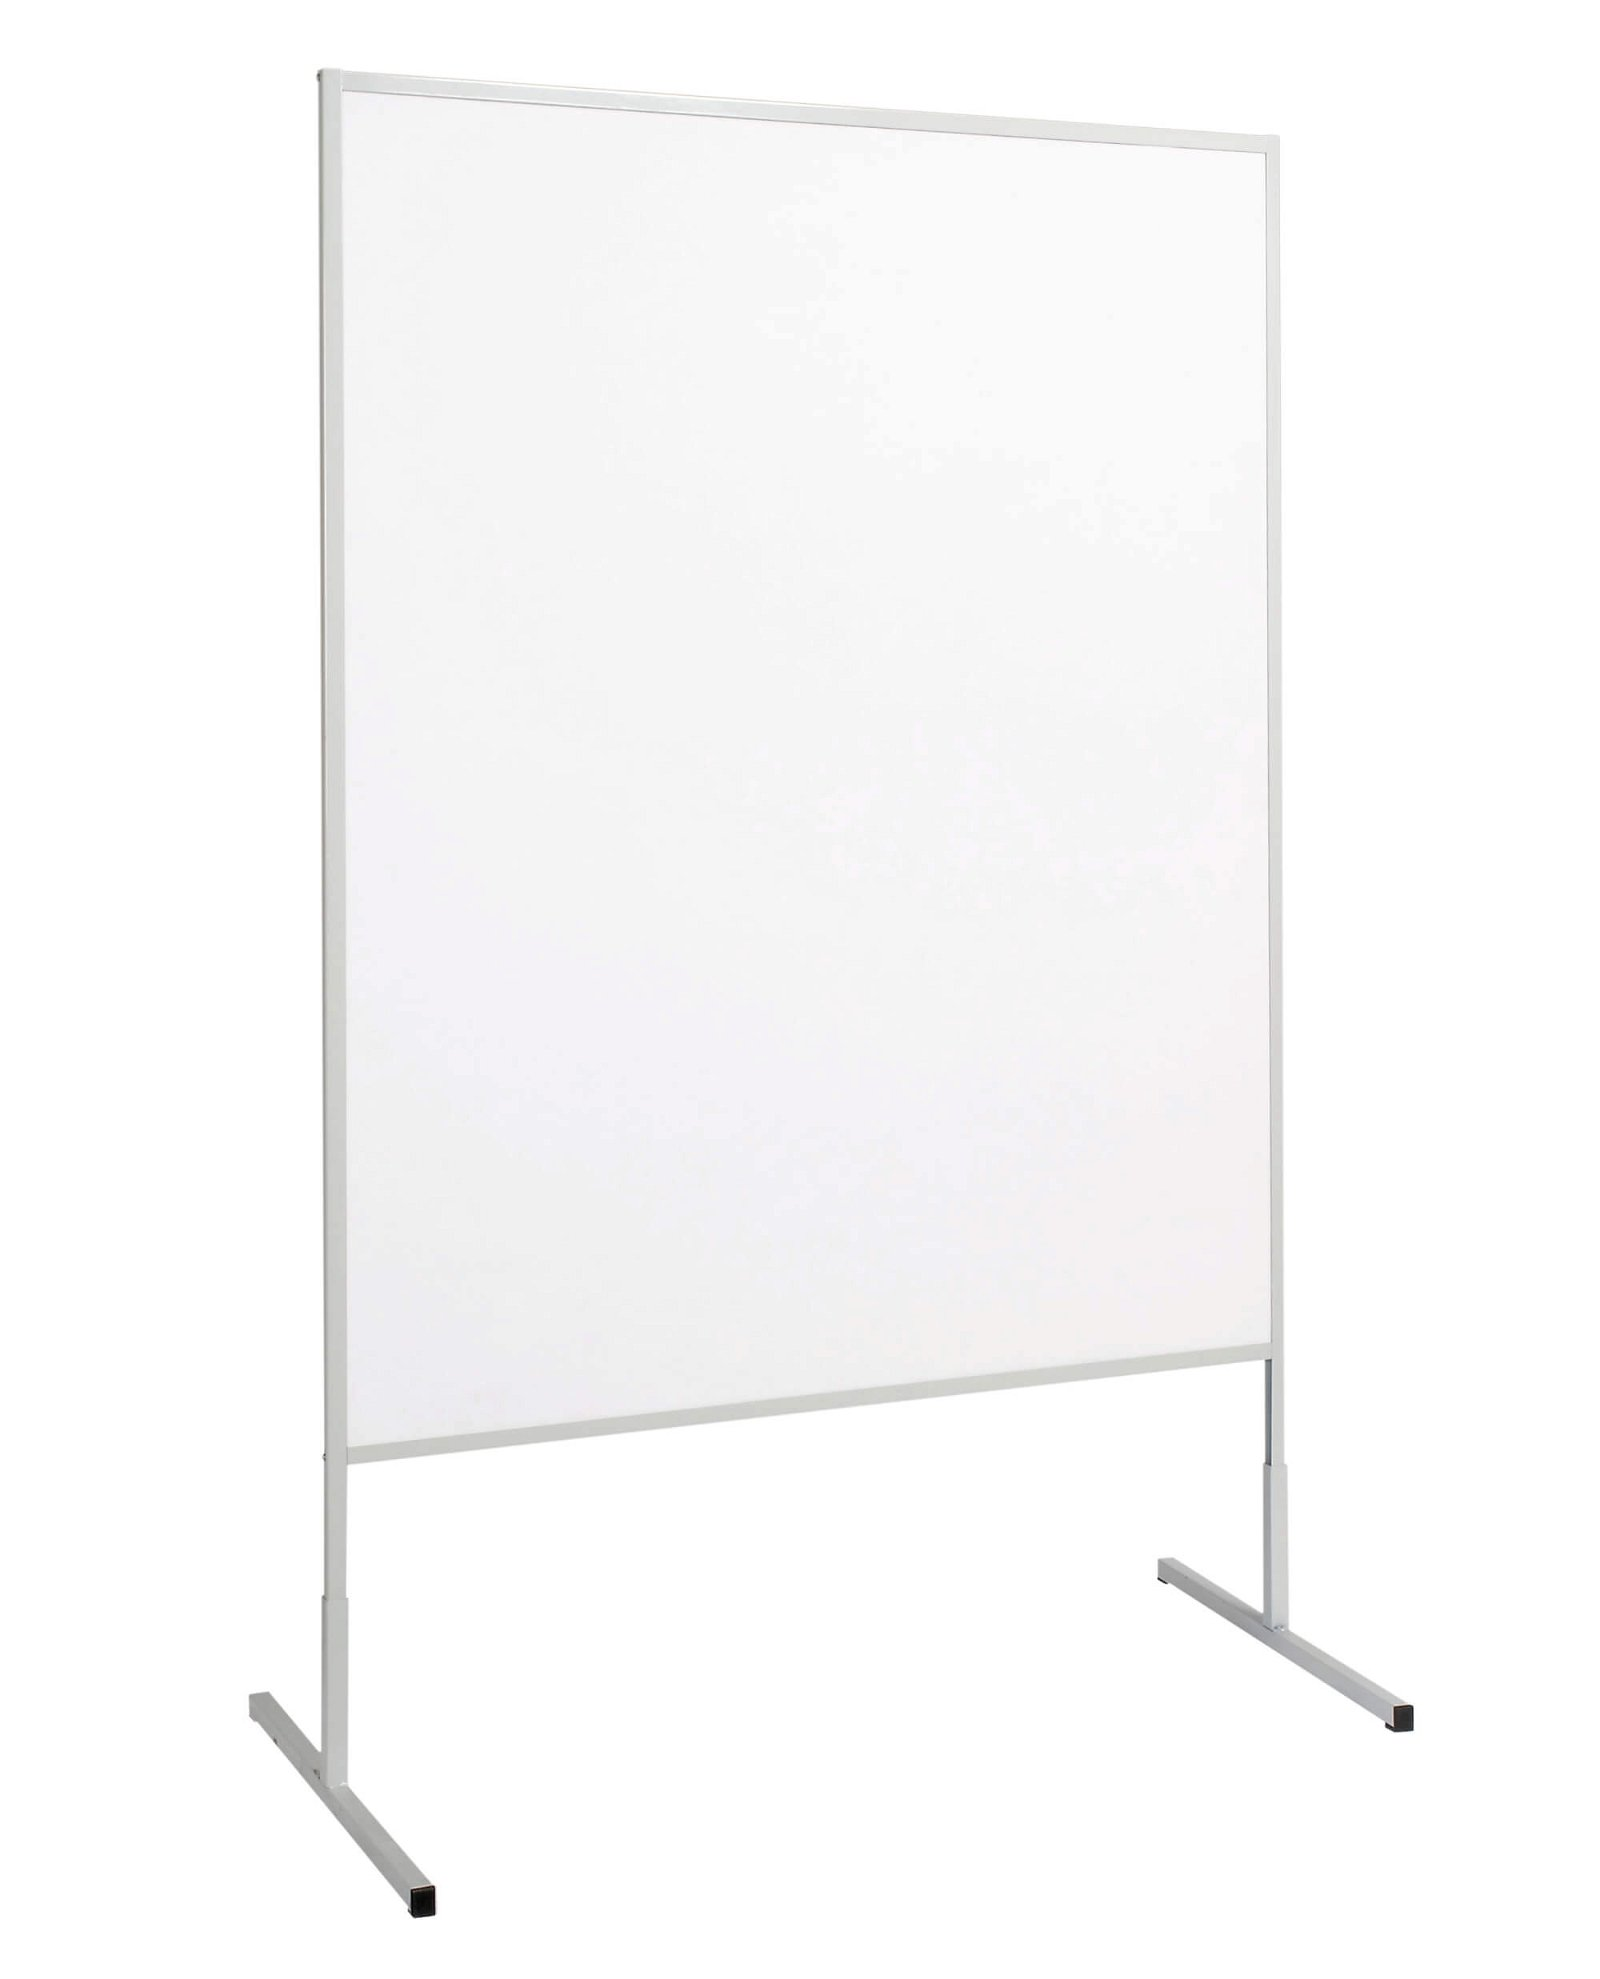 Moderationstafel MAULstandard Papier, 150x120 cm, grau